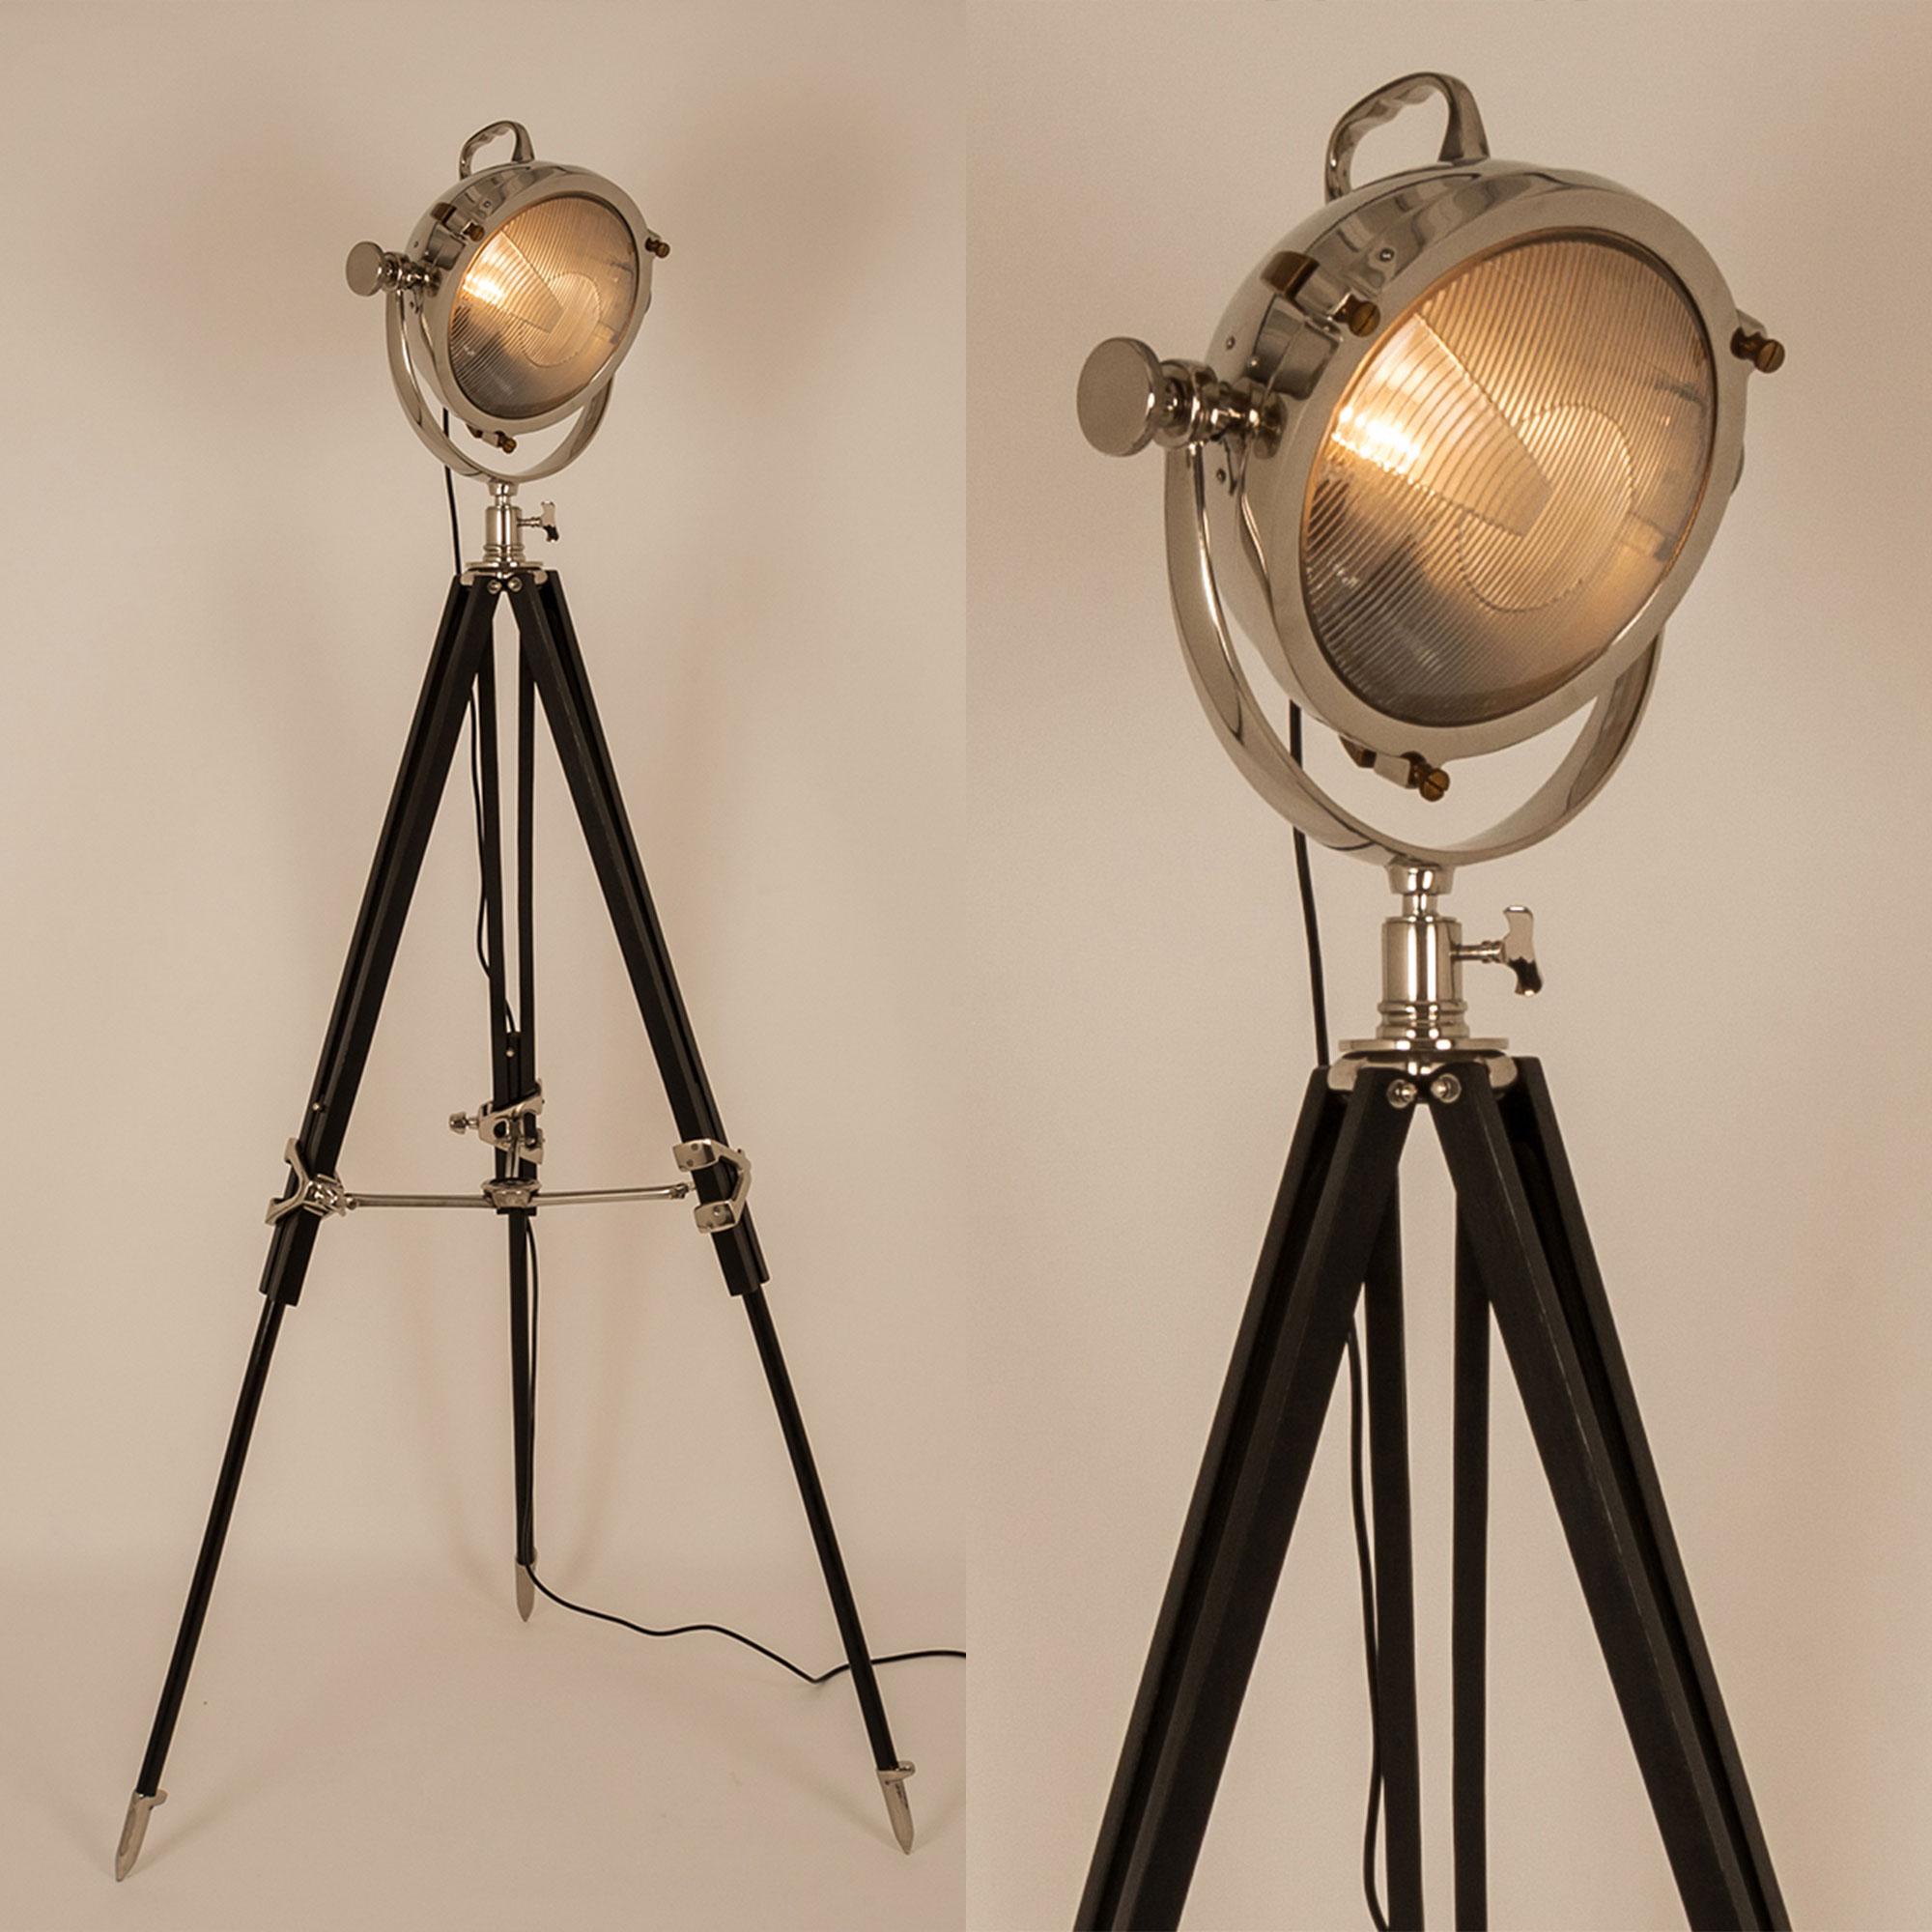 lighting all lighting screen tripod black floor lamp. Black Bedroom Furniture Sets. Home Design Ideas